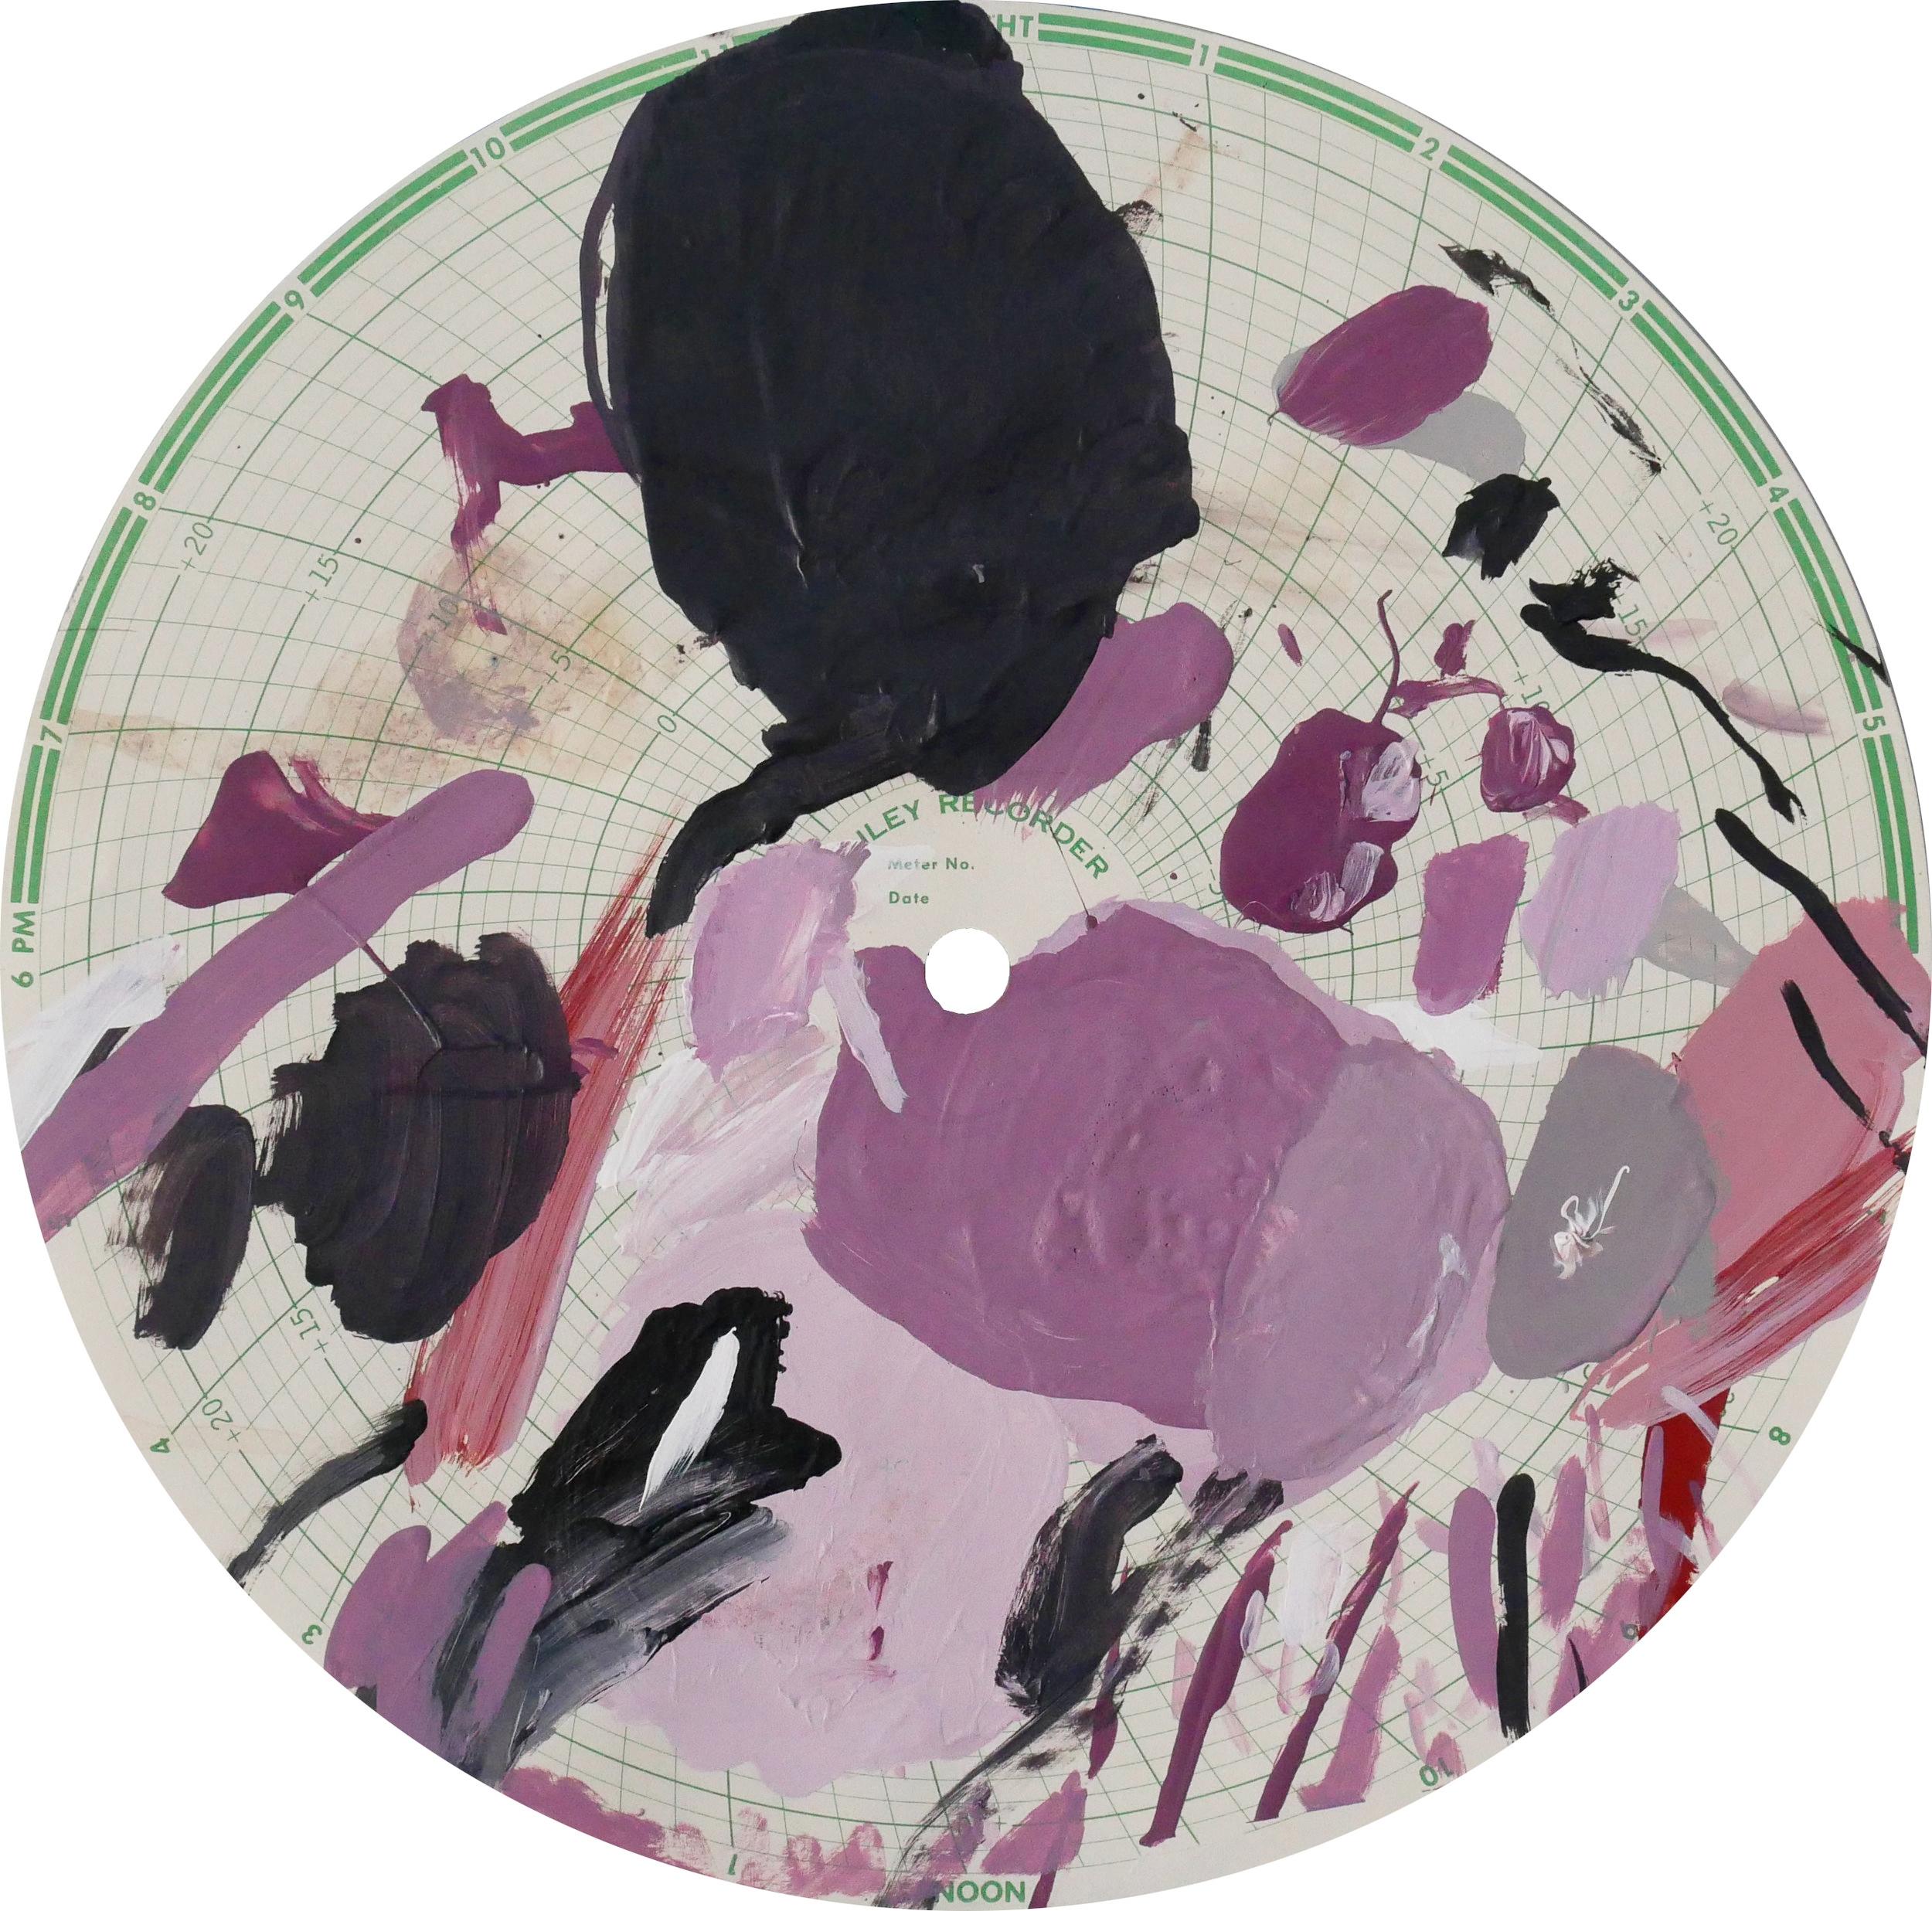 Midnight Recorder (2404)   Acrylic on paper 11.1 in diameter 28.2 cm diameter